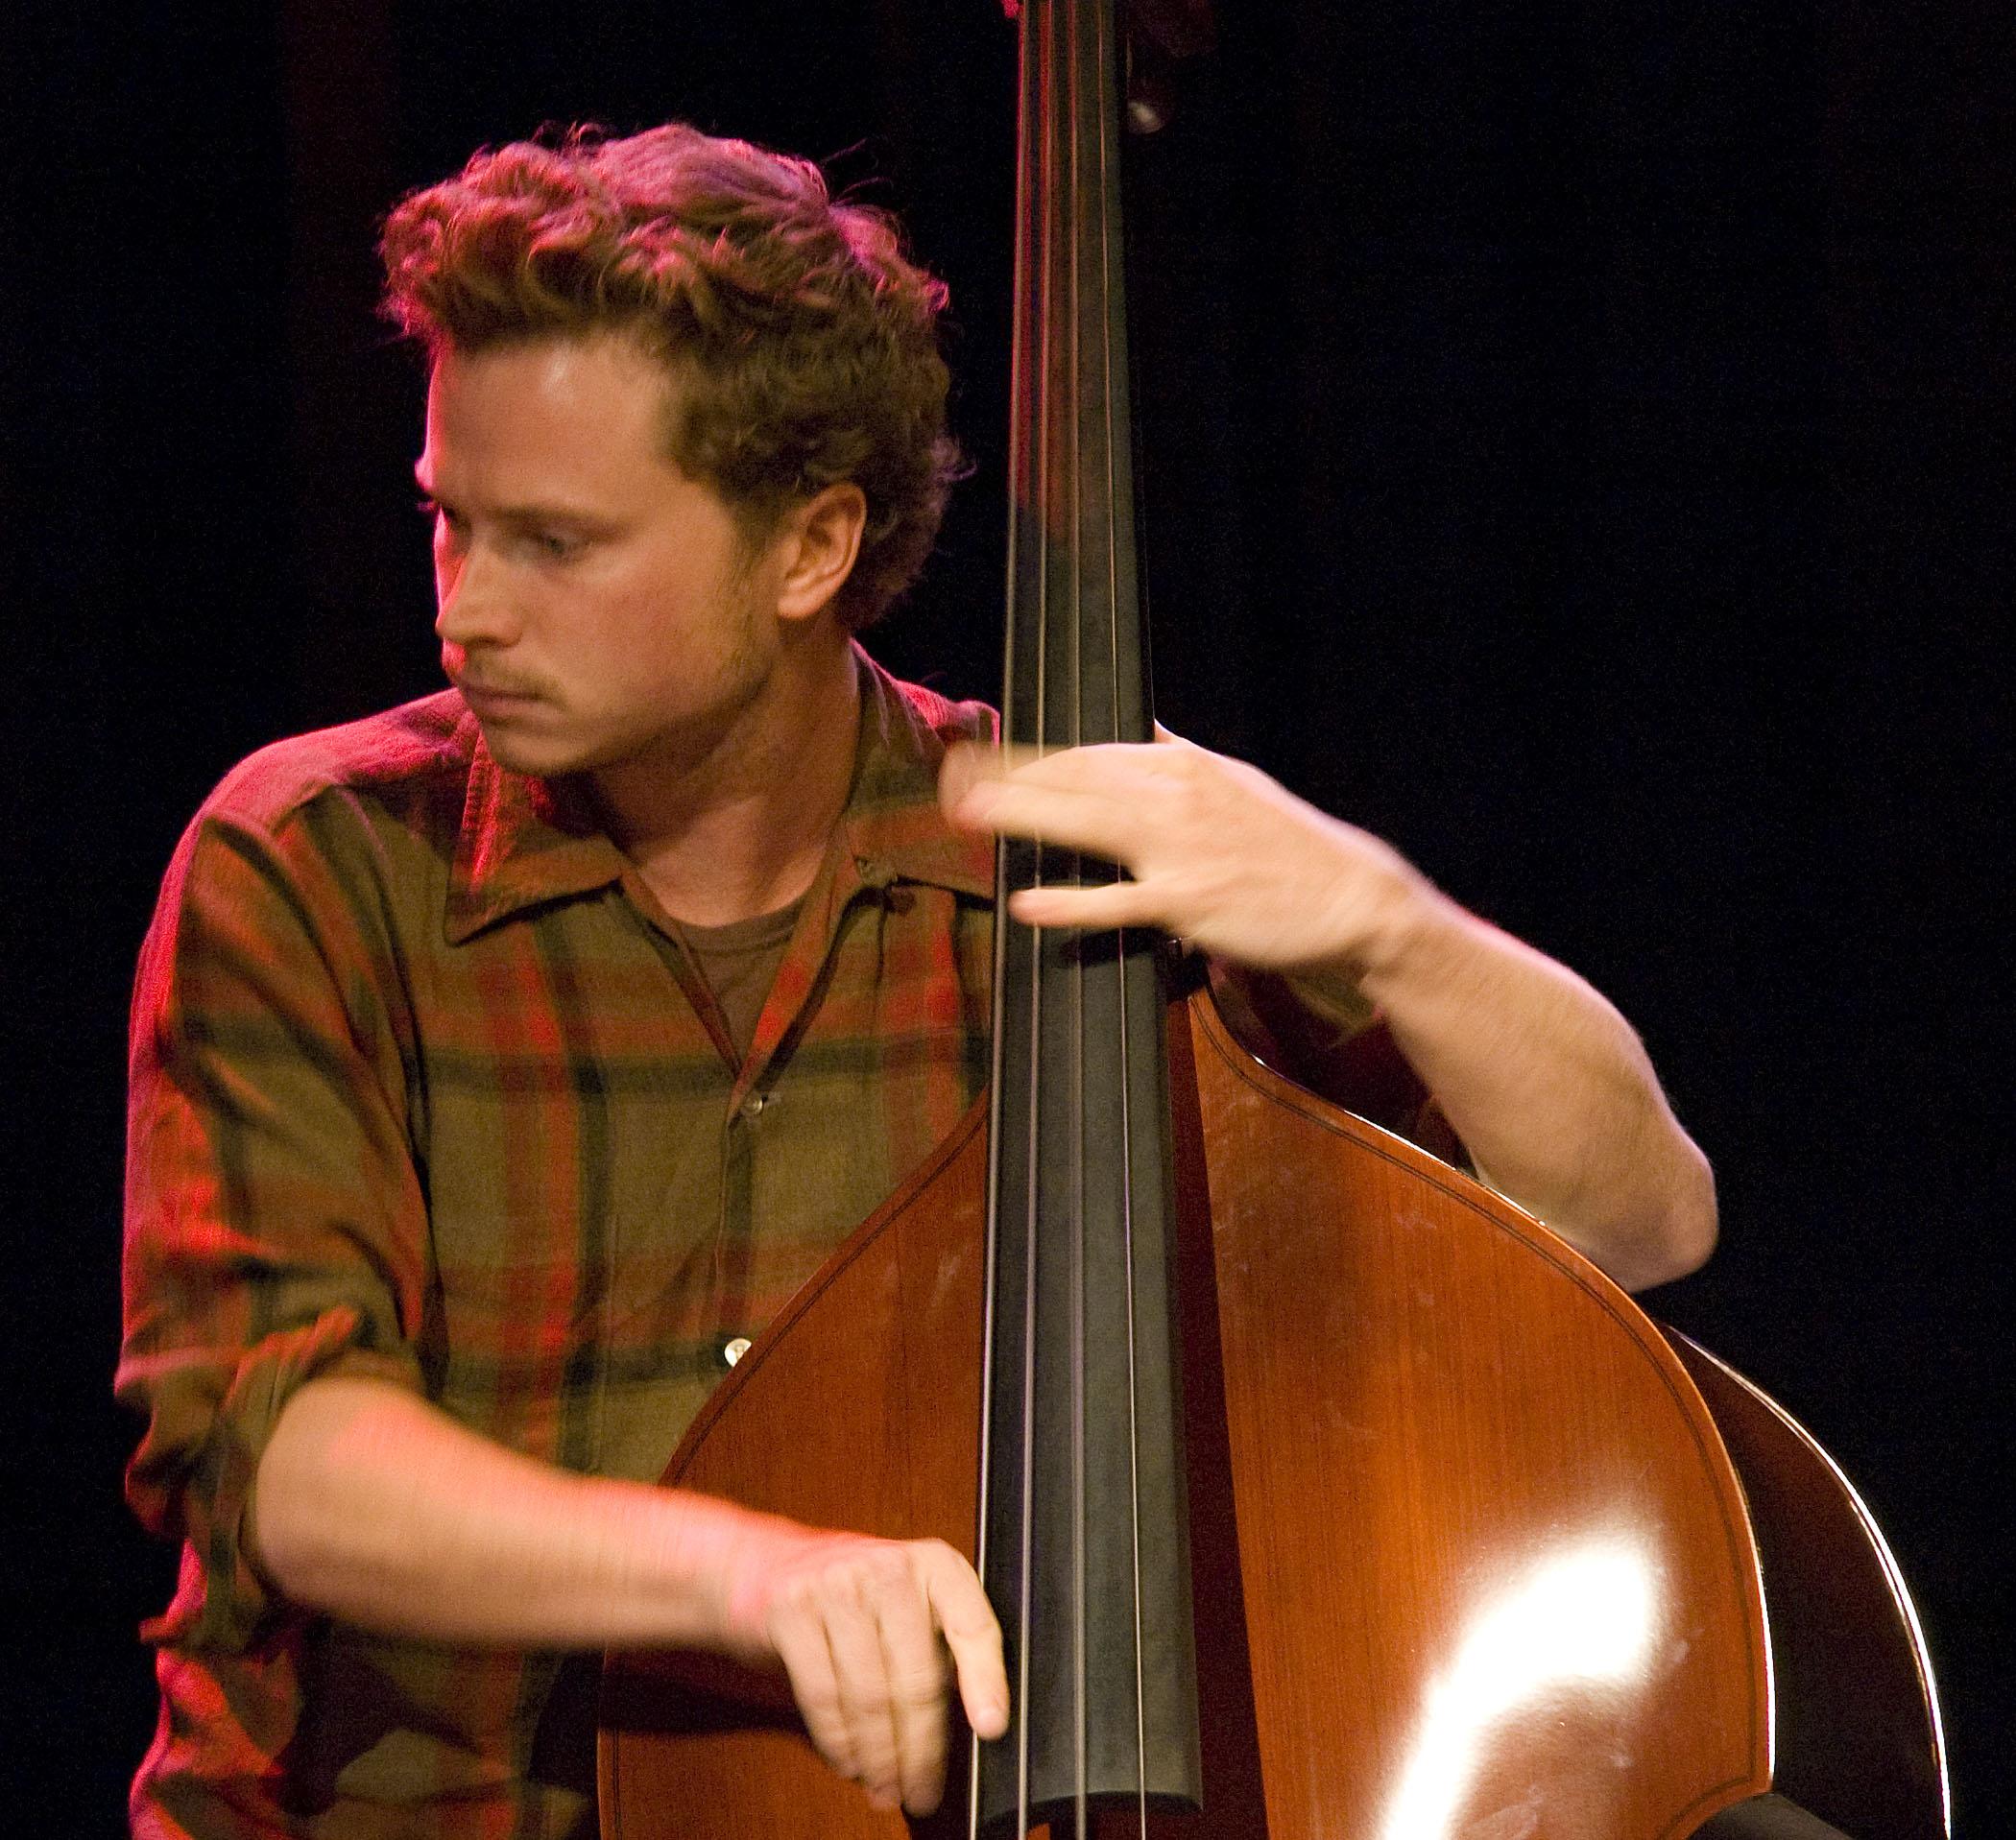 Milo Fitzpatrick of Quartet, L'Astral, Montreal, Canada 10/02/2010